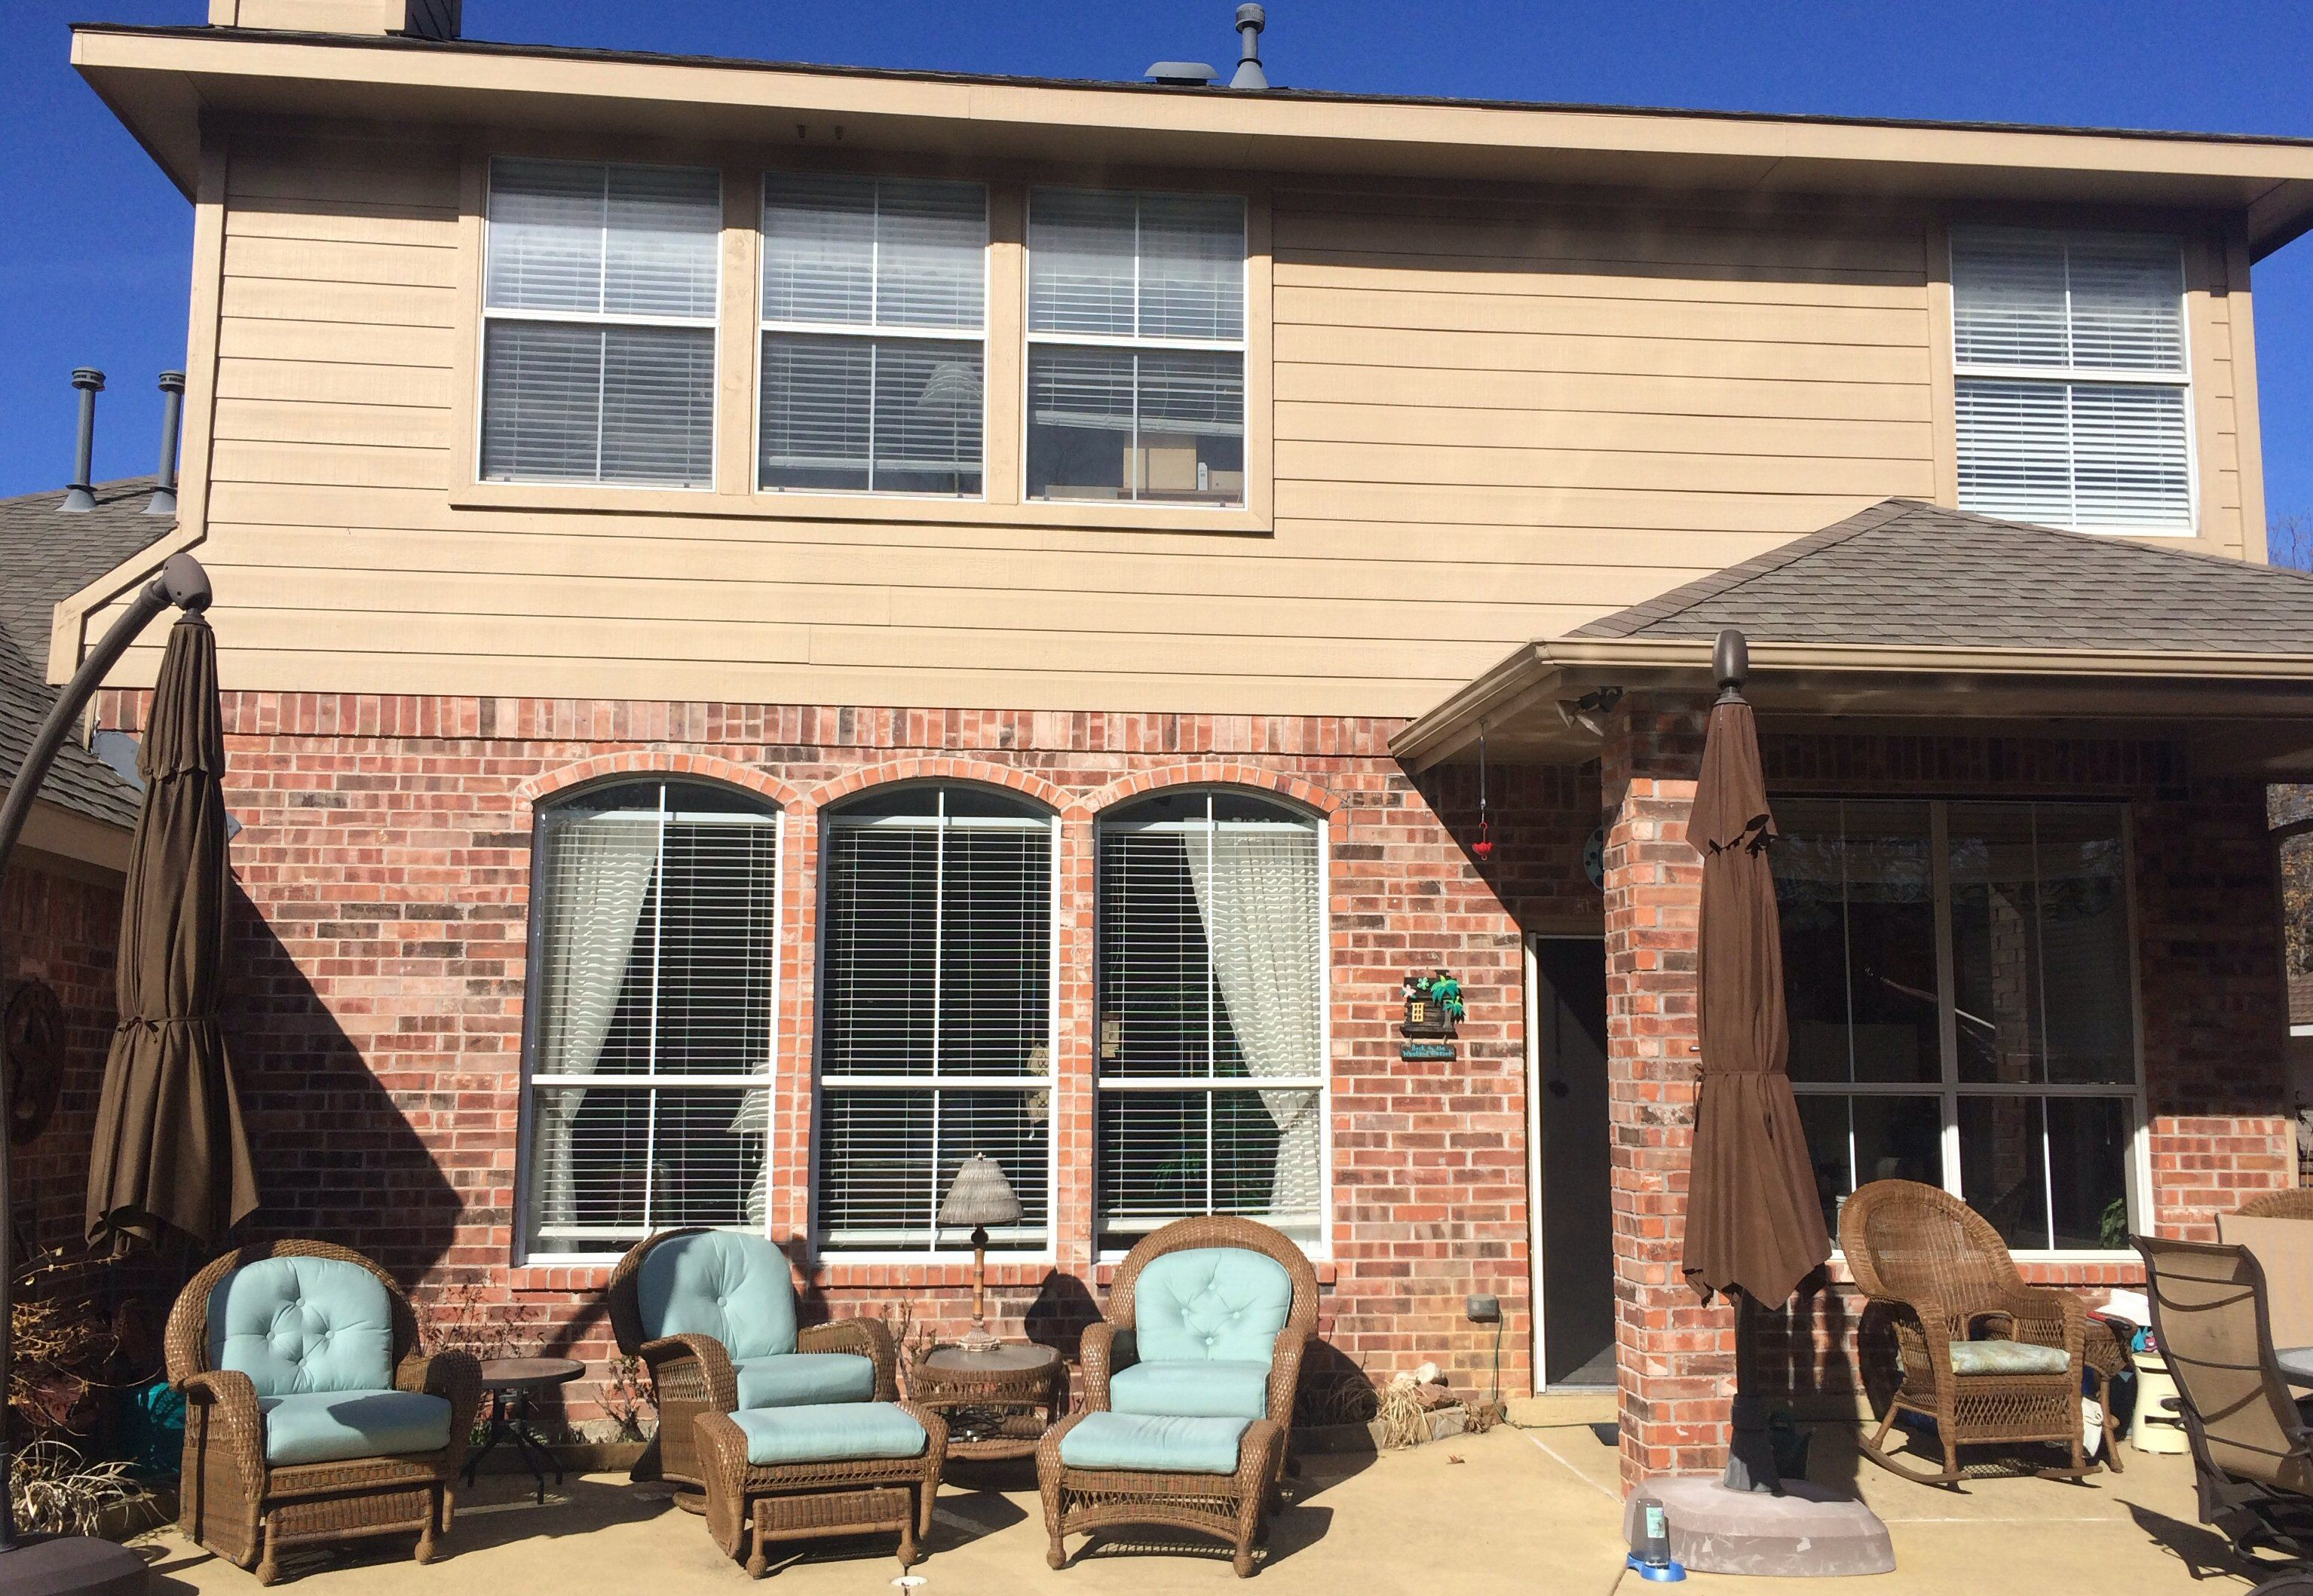 Brick veneer in the back of a suburban home near Dallas, Texas